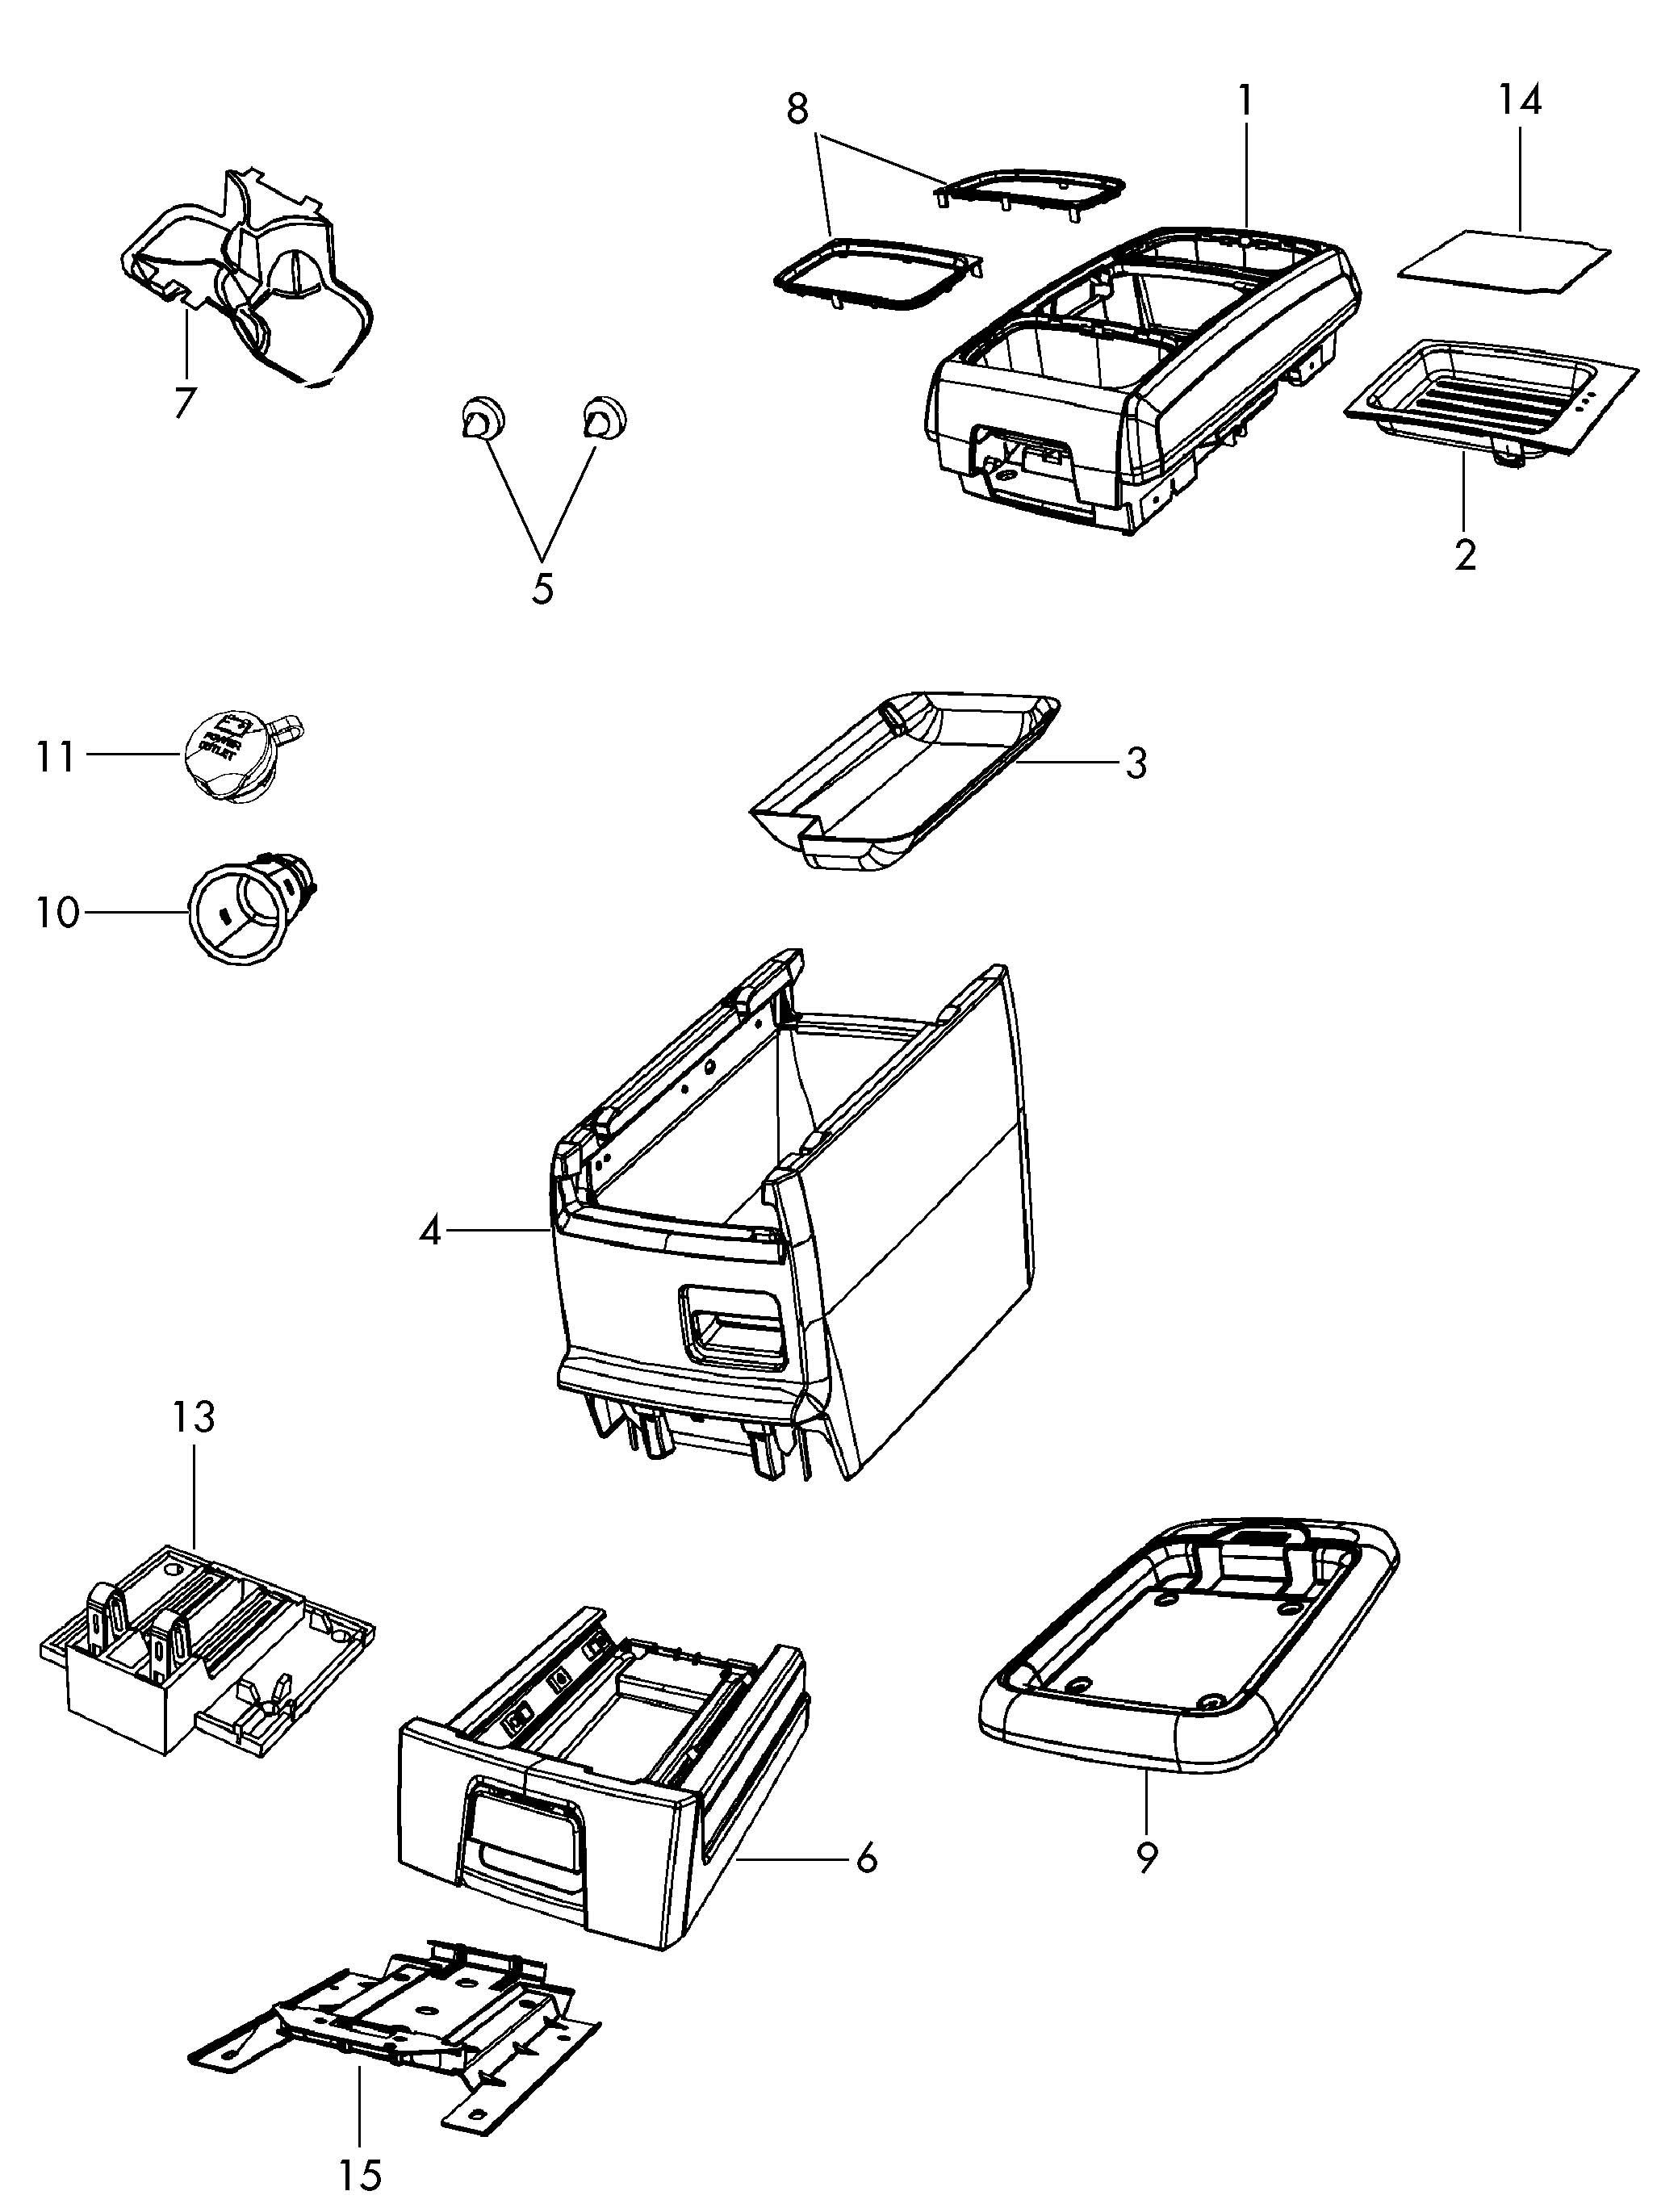 Vw rabbit gti mk1 wiring diagram for 1984 vw rabbit wiring diagram at free 2006 volkswagen rabbit fuse box diagram